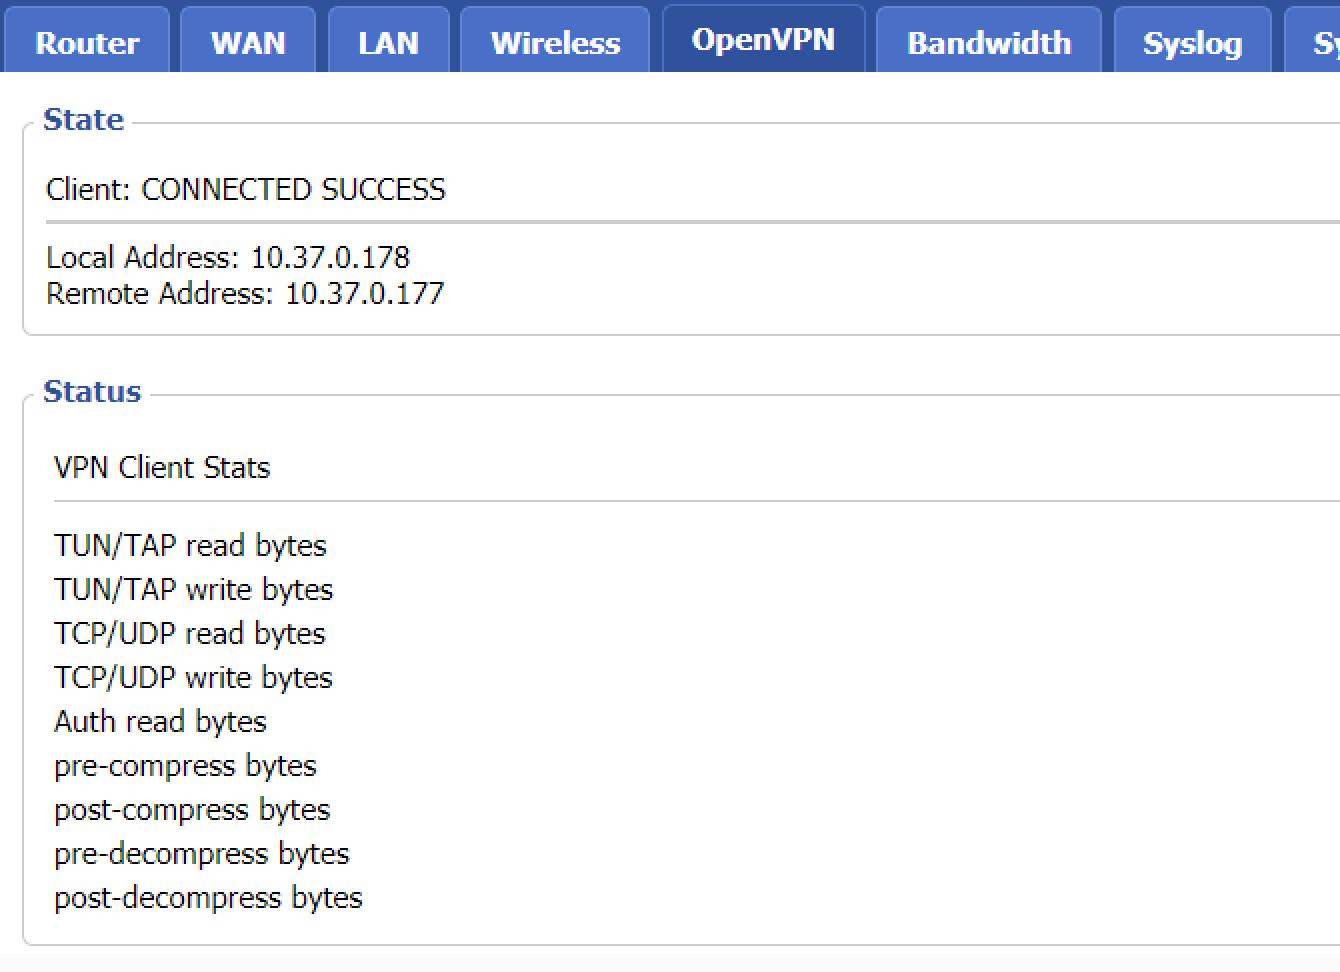 OpenVPN接続に成功しました。